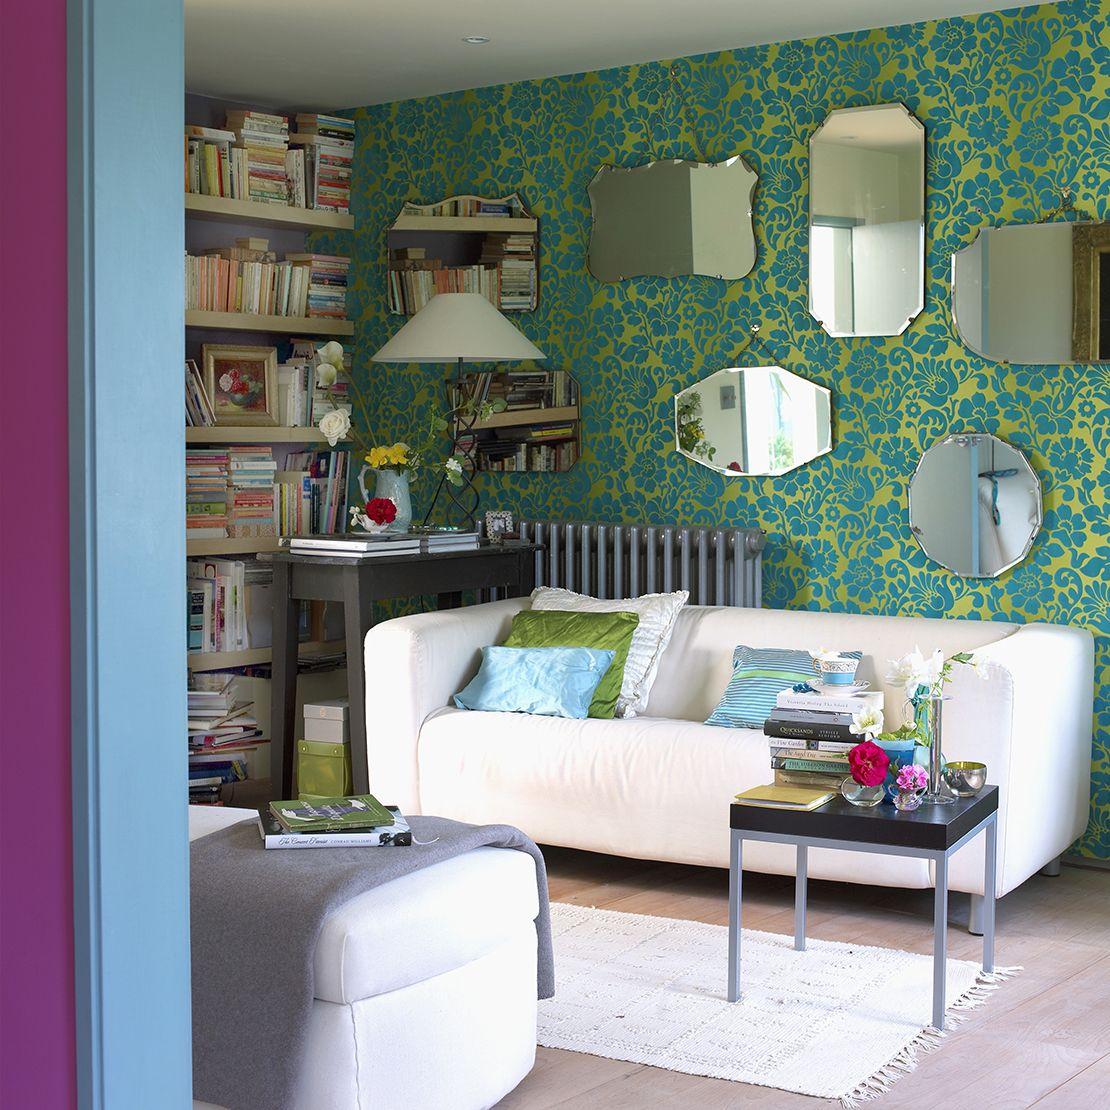 Декор стен | Идеи для украшения, Декор стен, Декор